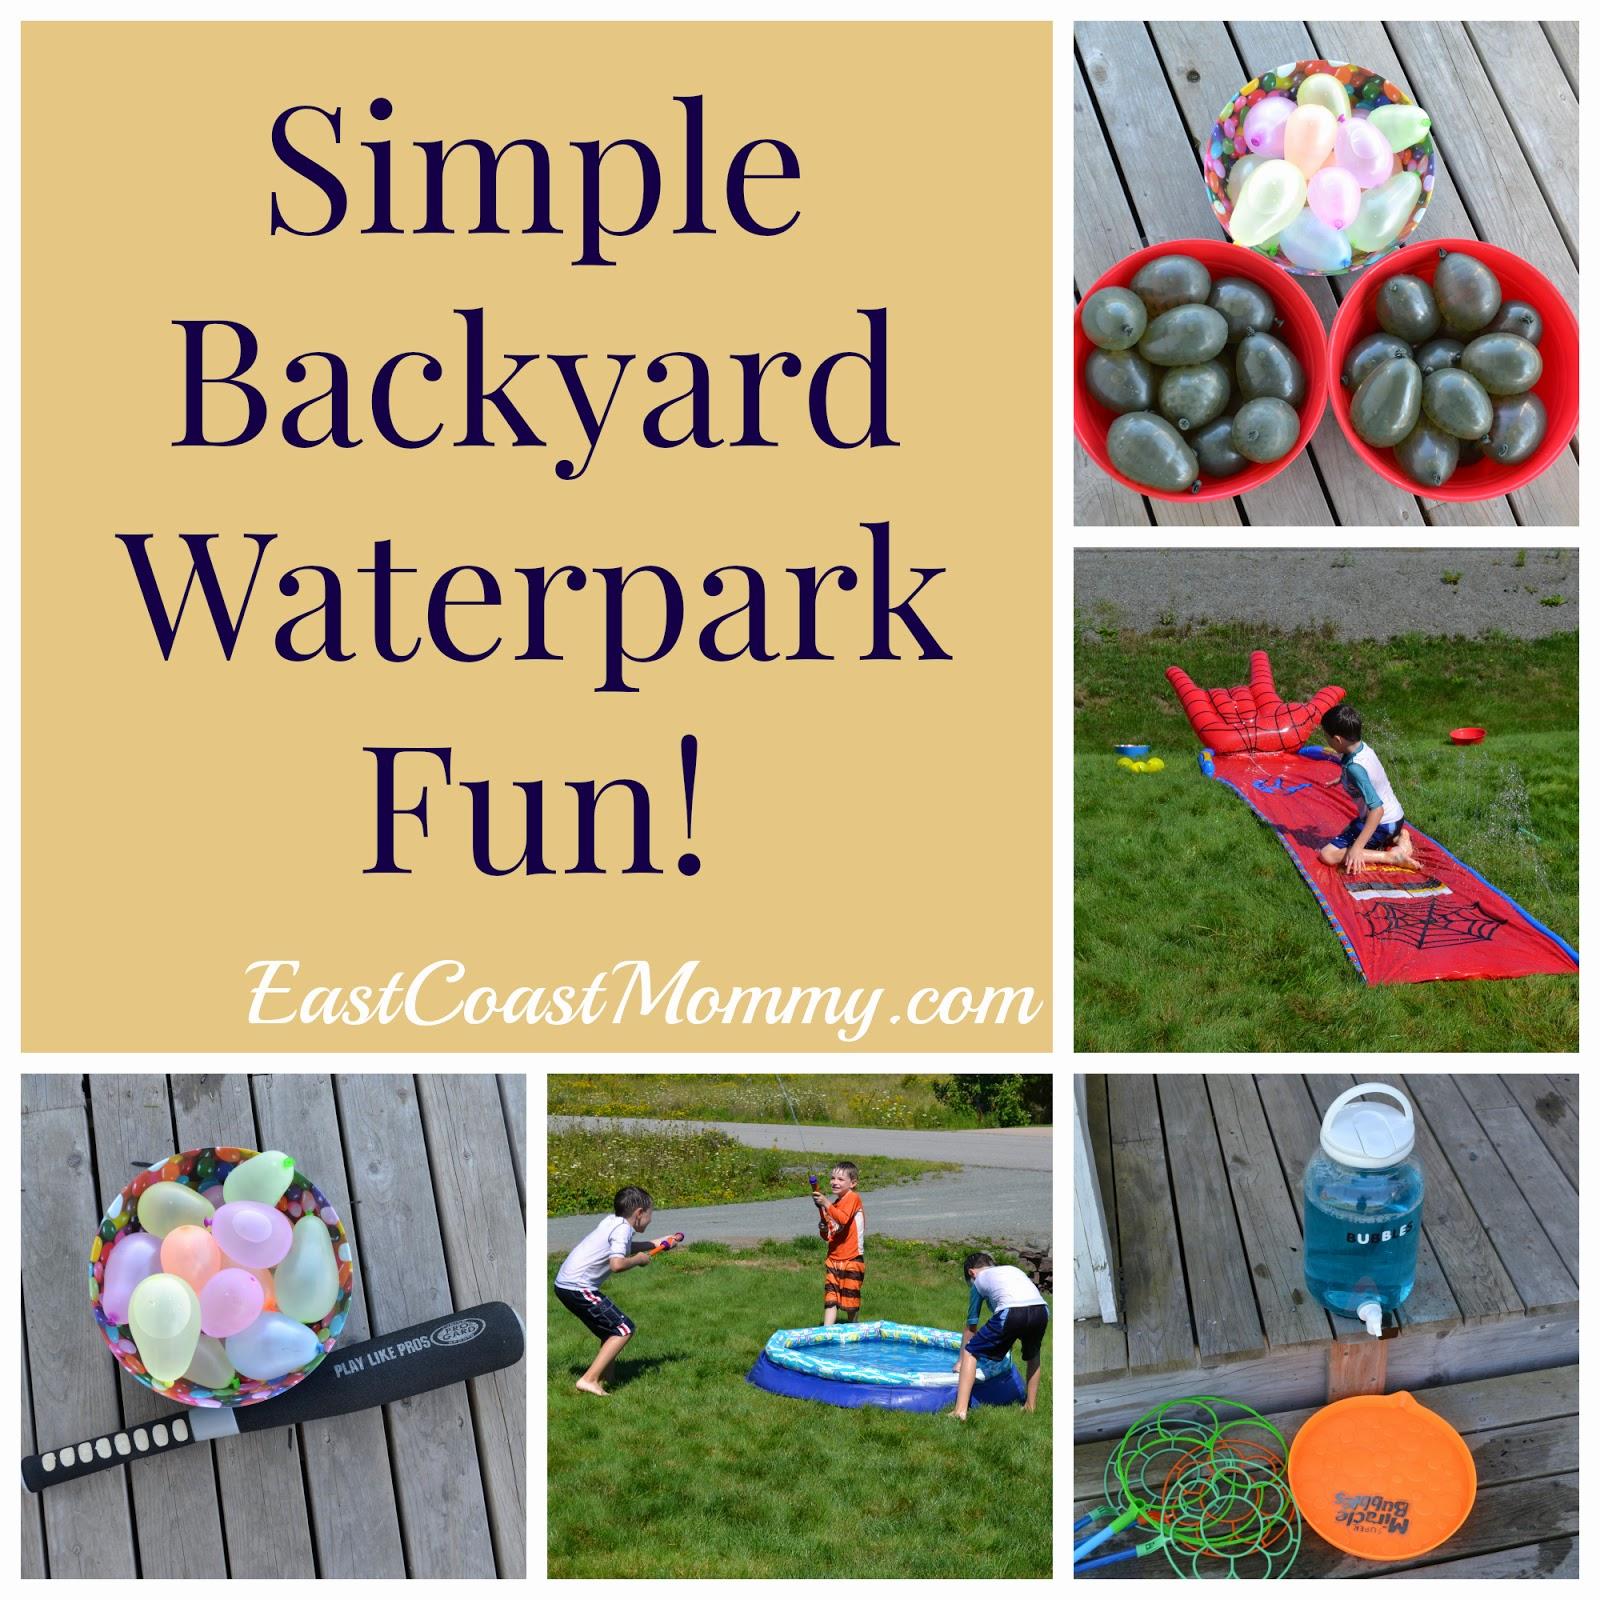 East Coast Mommy: Simple Backyard Water Park